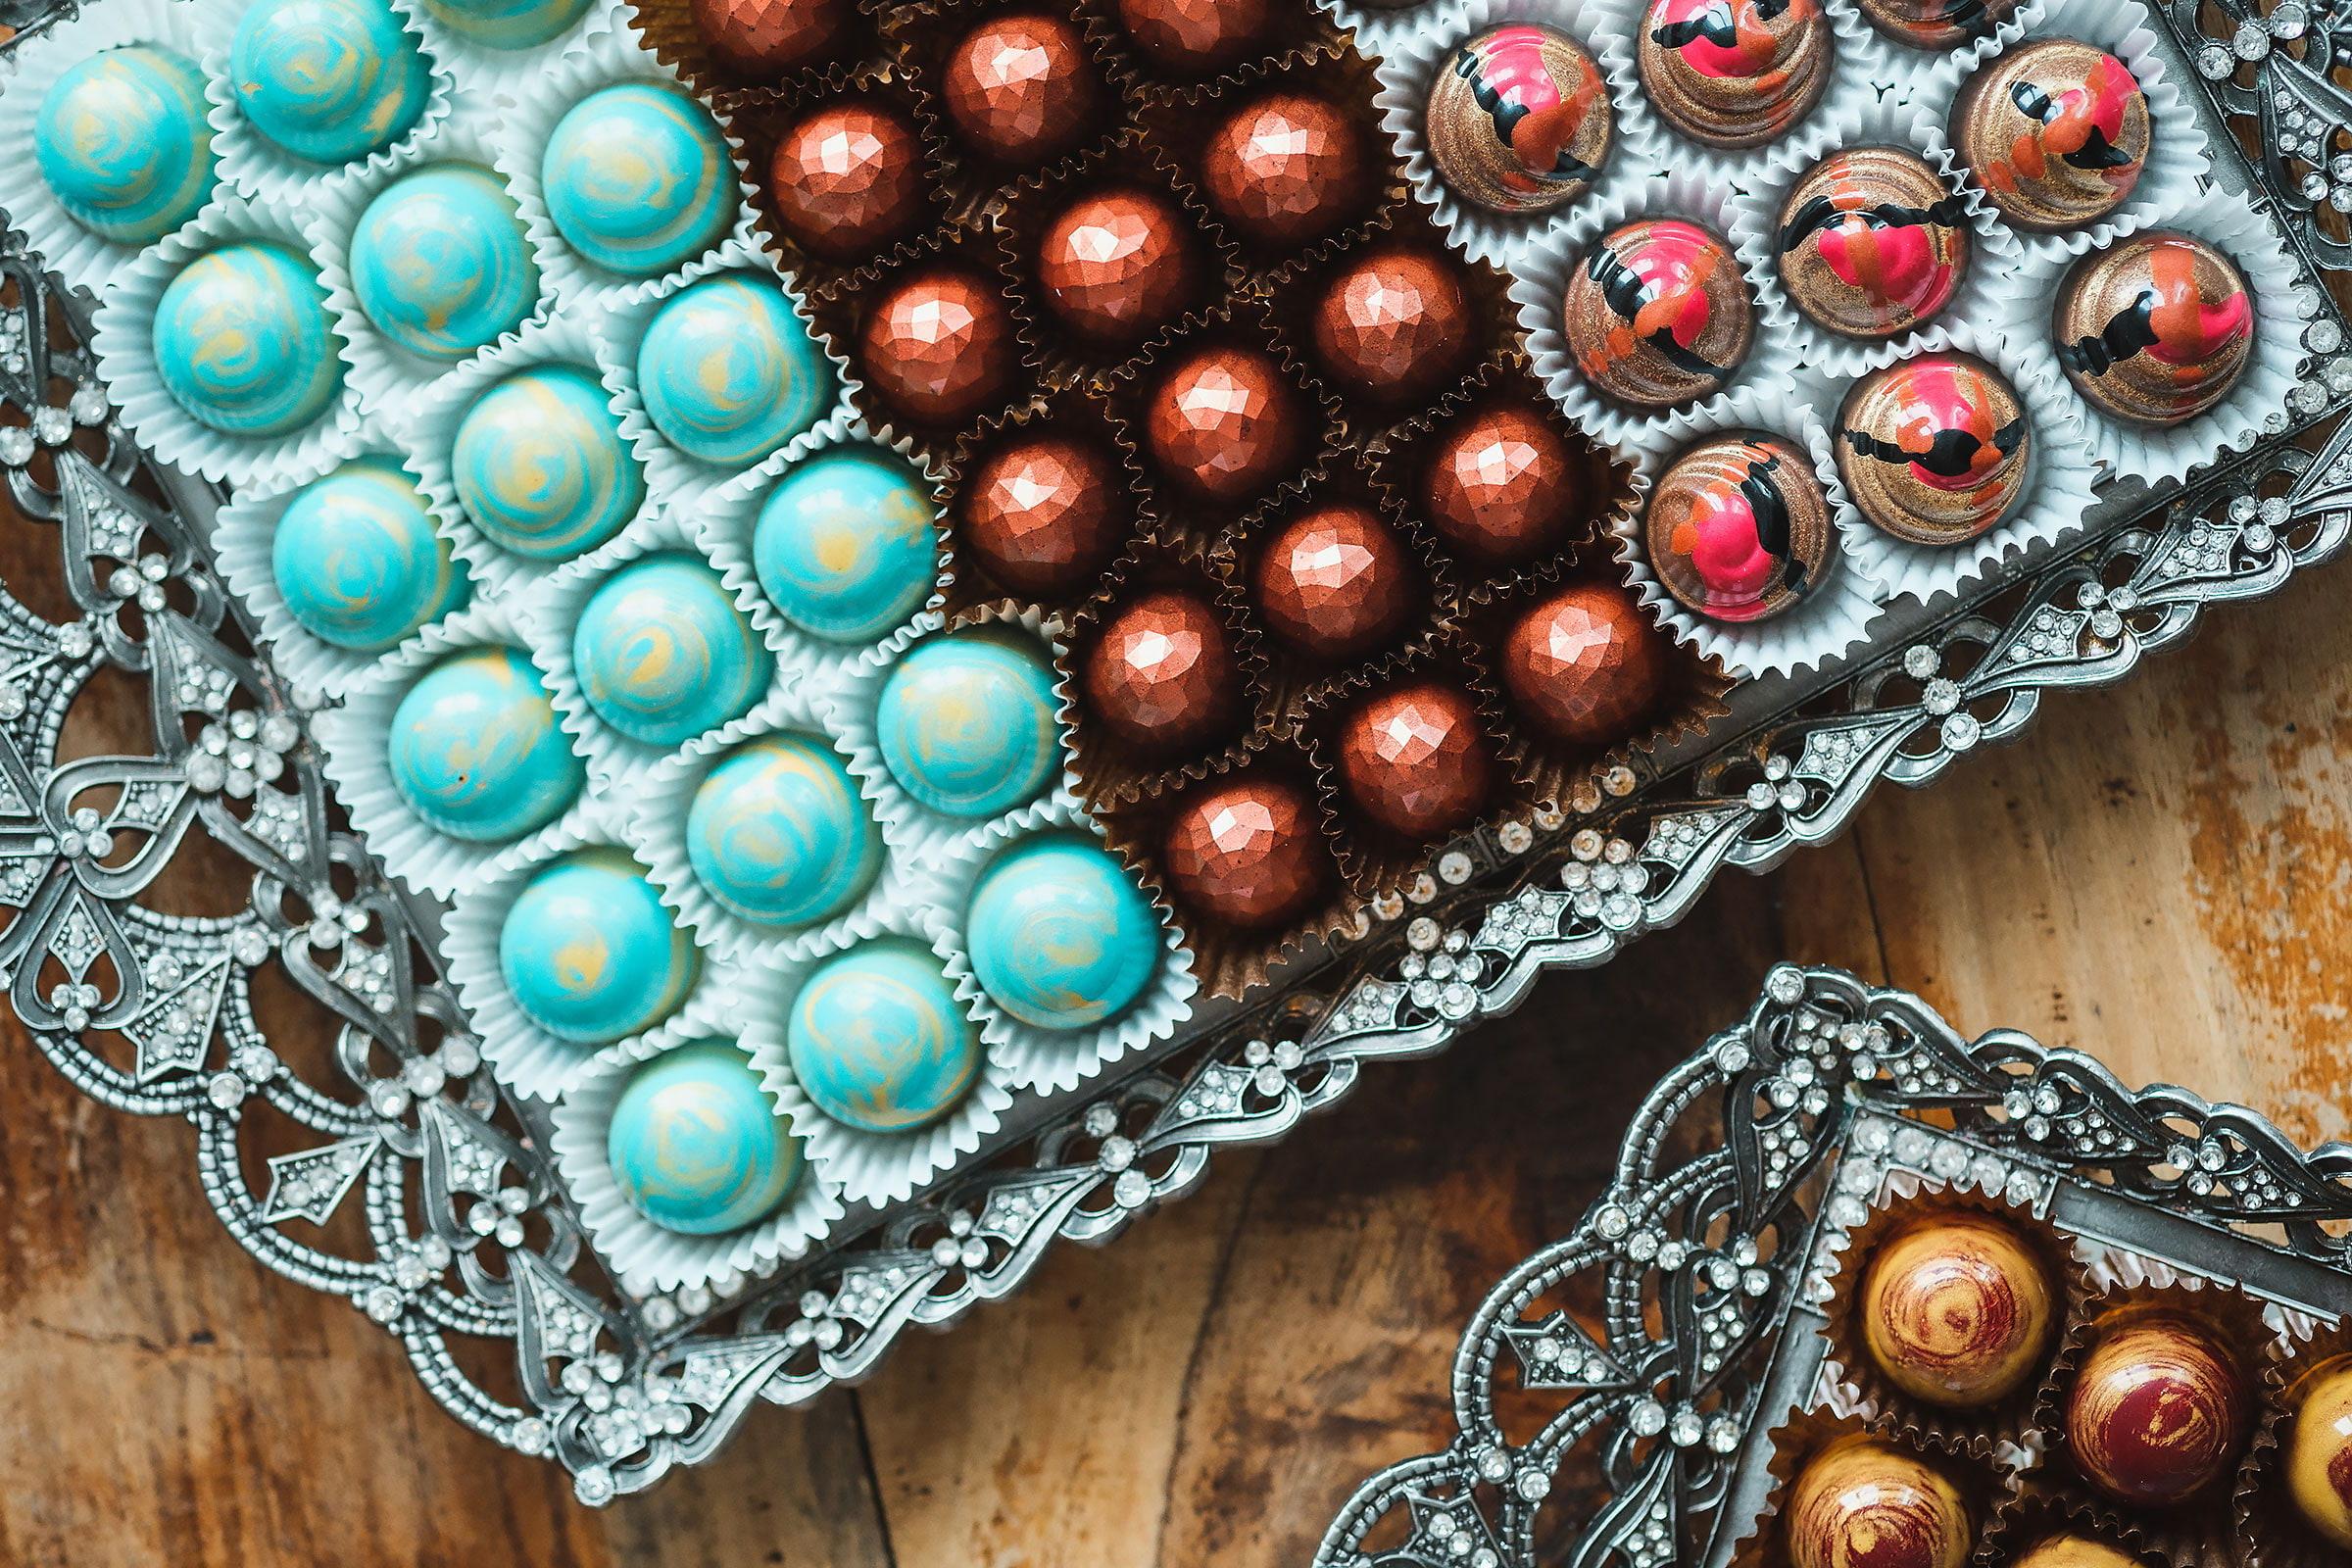 choklad fabriken stockholm